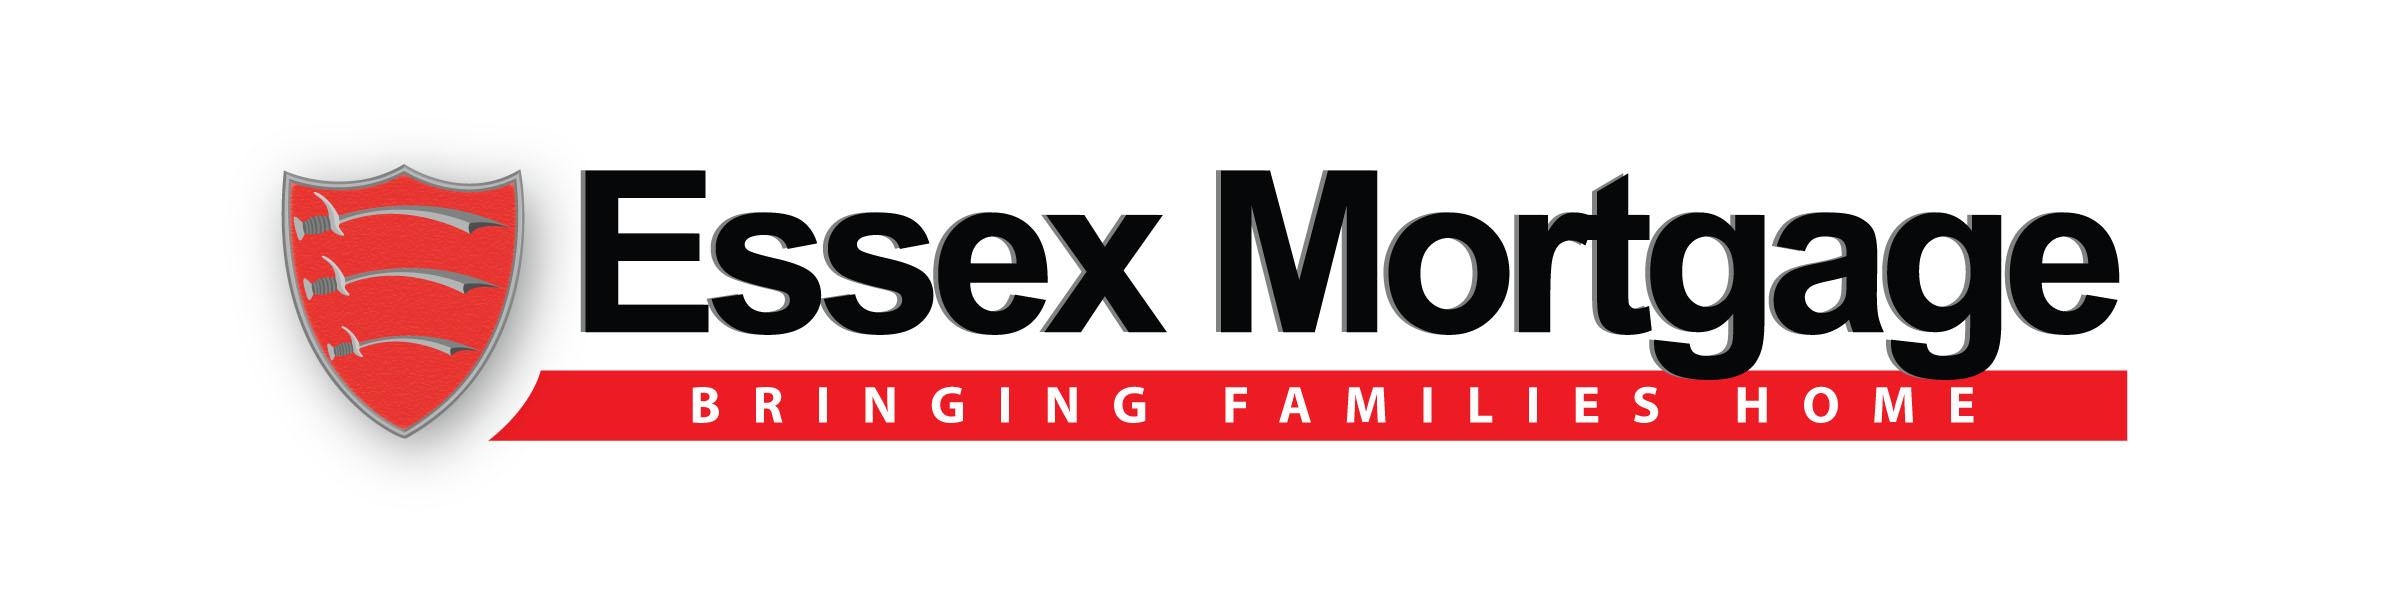 Essex Mortgage Company Logo